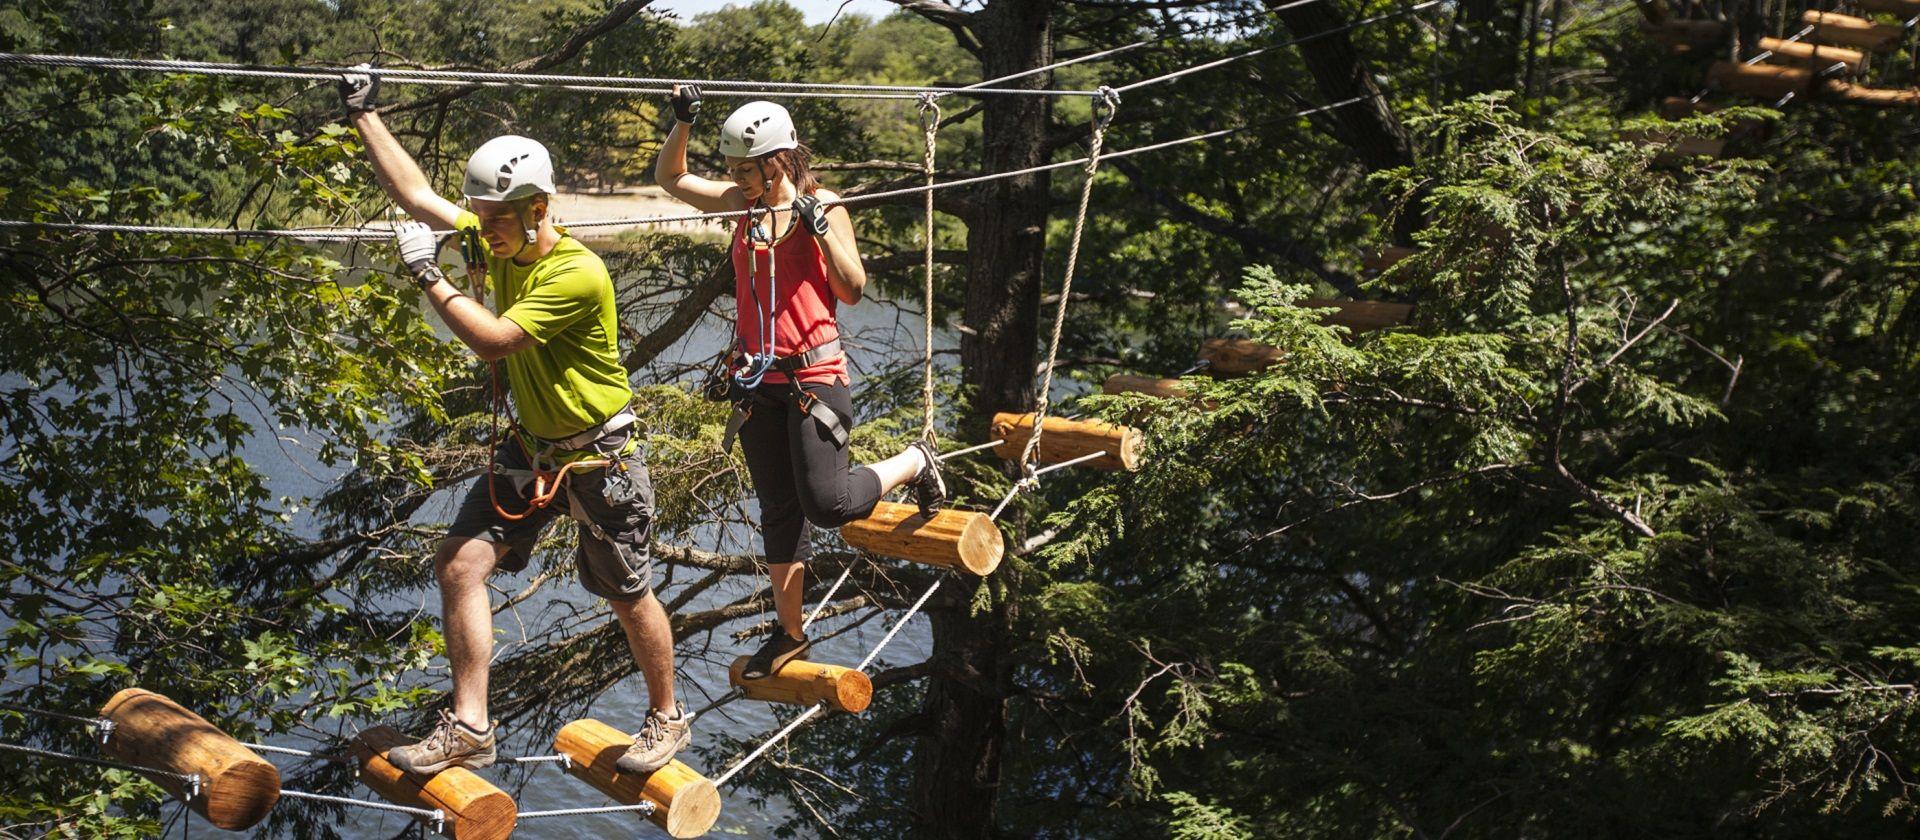 Activities Treetop Trekking Heart Lake Hero Jpg 1920 840 Trekking Brampton Adventure Park